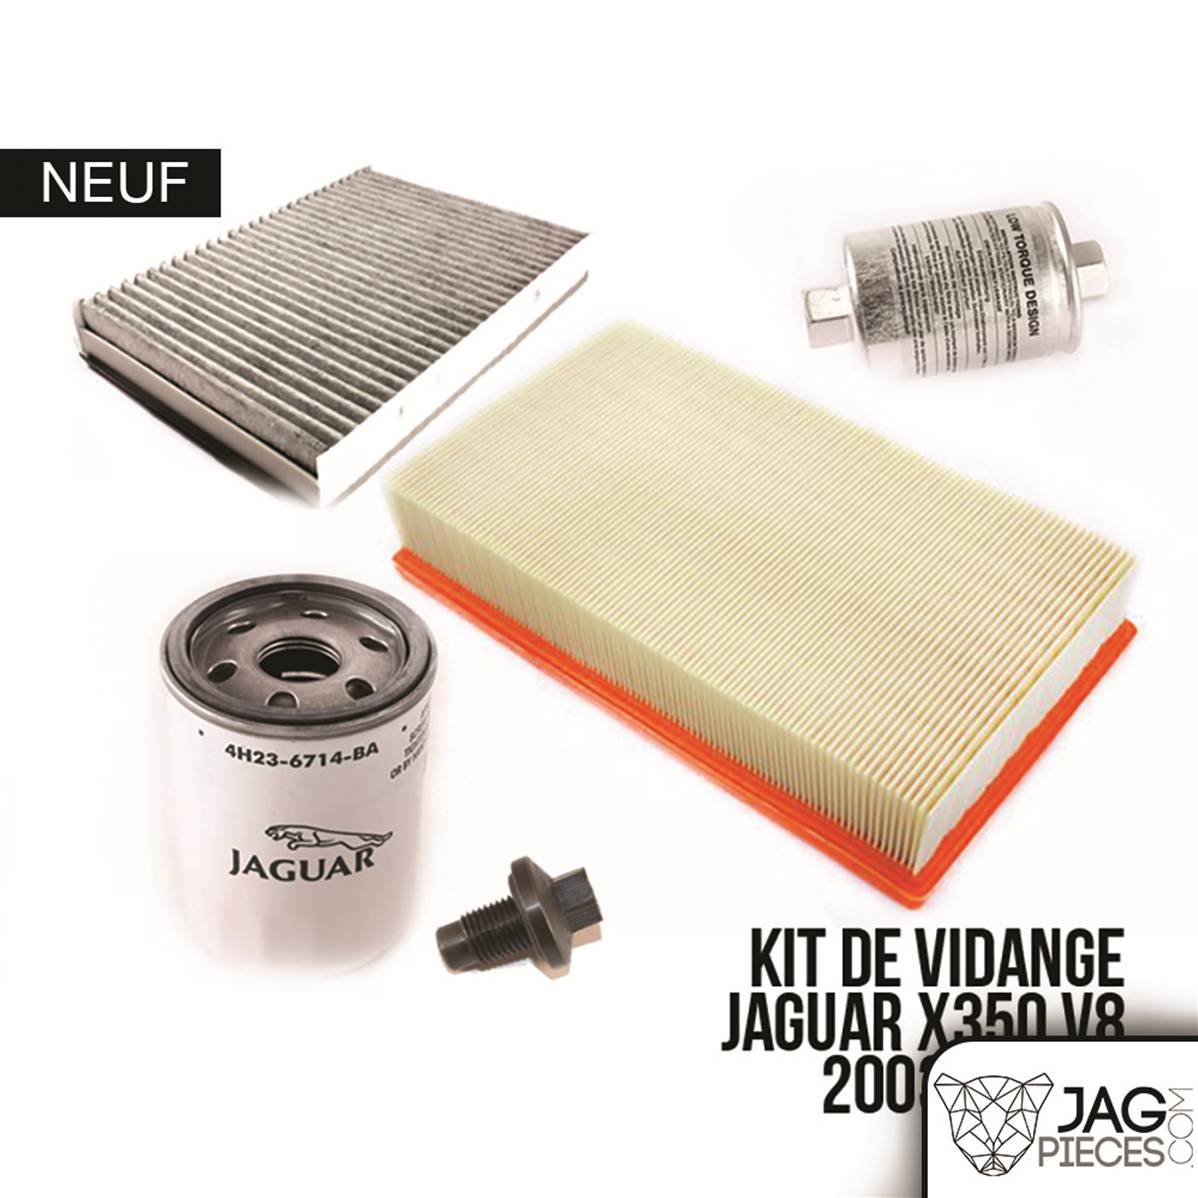 kit de vidange moteur x350 kvxjv8 jaguar xj x350 2003 2009 v8 essence. Black Bedroom Furniture Sets. Home Design Ideas